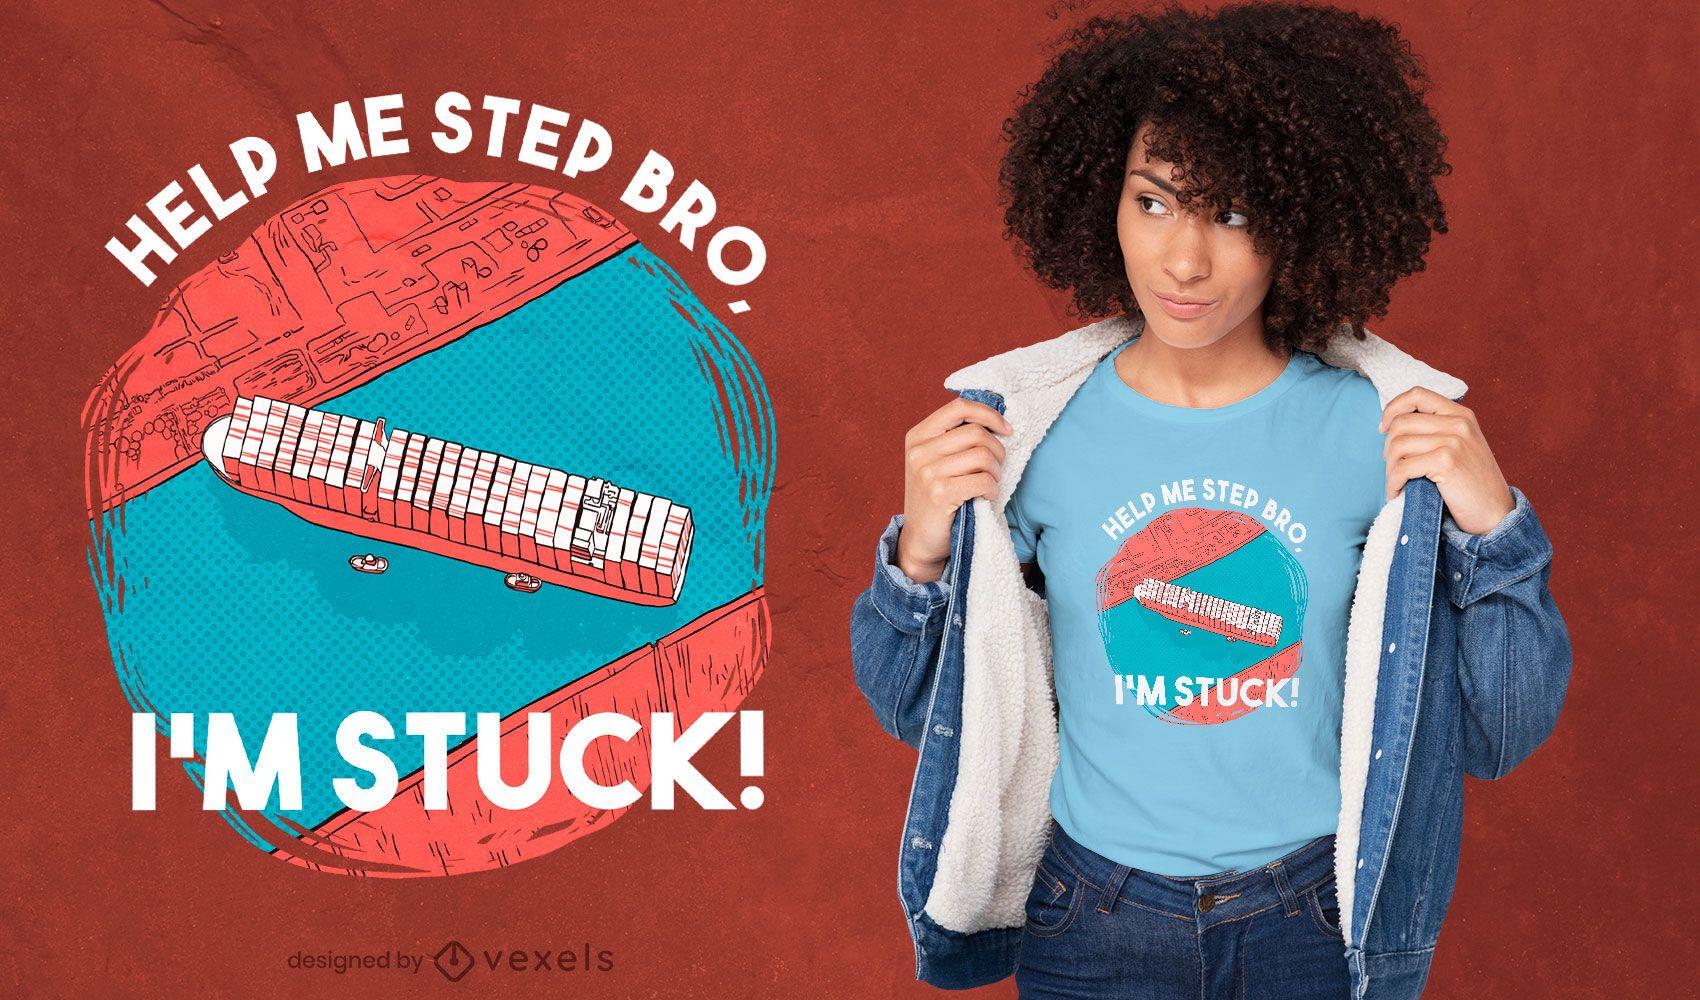 Stuck cargo ship t-shirt design